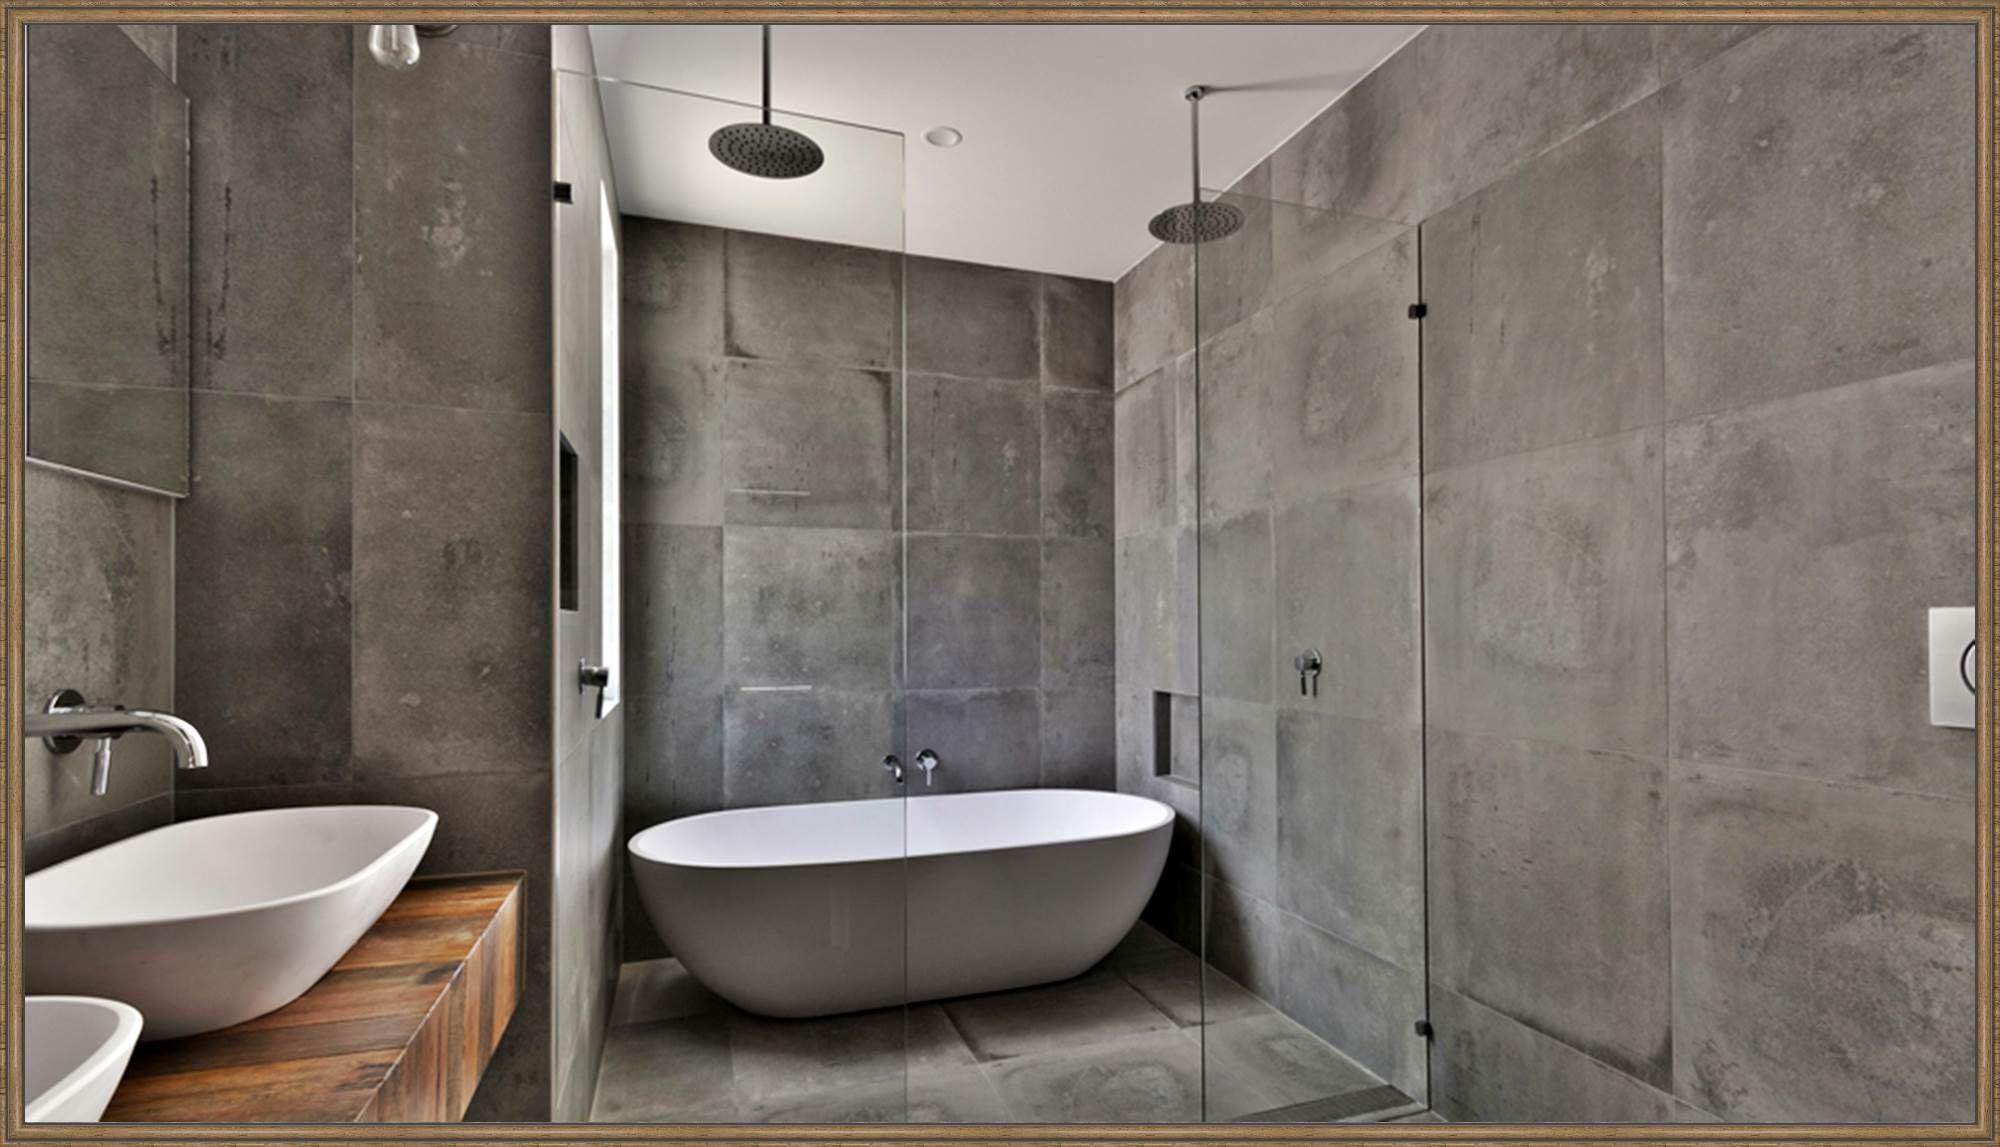 Bildergebnis Fur Badezimmer Beton Holzoptik Modernes Badezimmerdesign Modernes Badezimmer Bad Styling